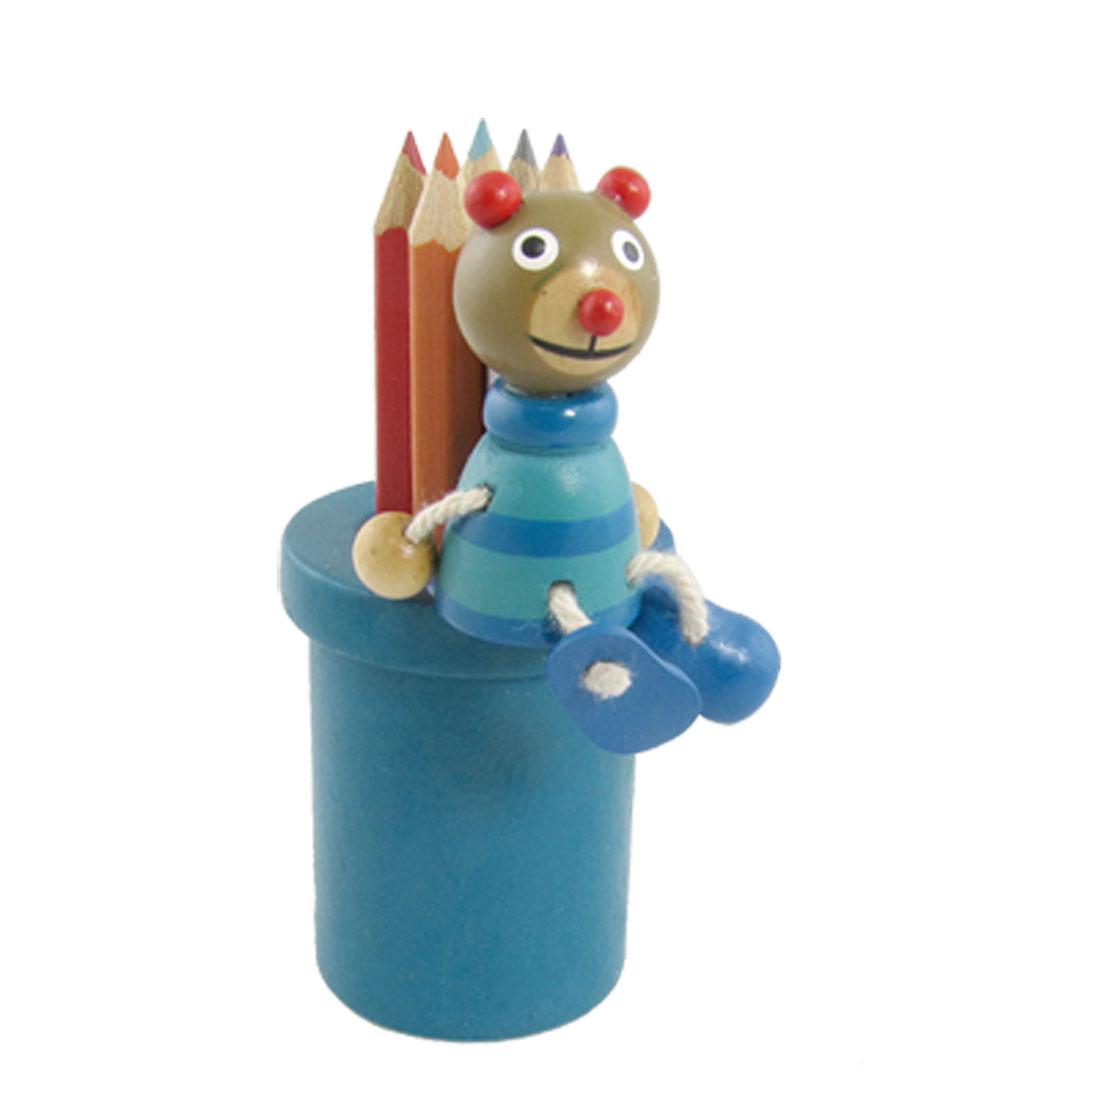 Mini Blue Cartoon Mouse Cylinder Wooden Pen Holder Organizer